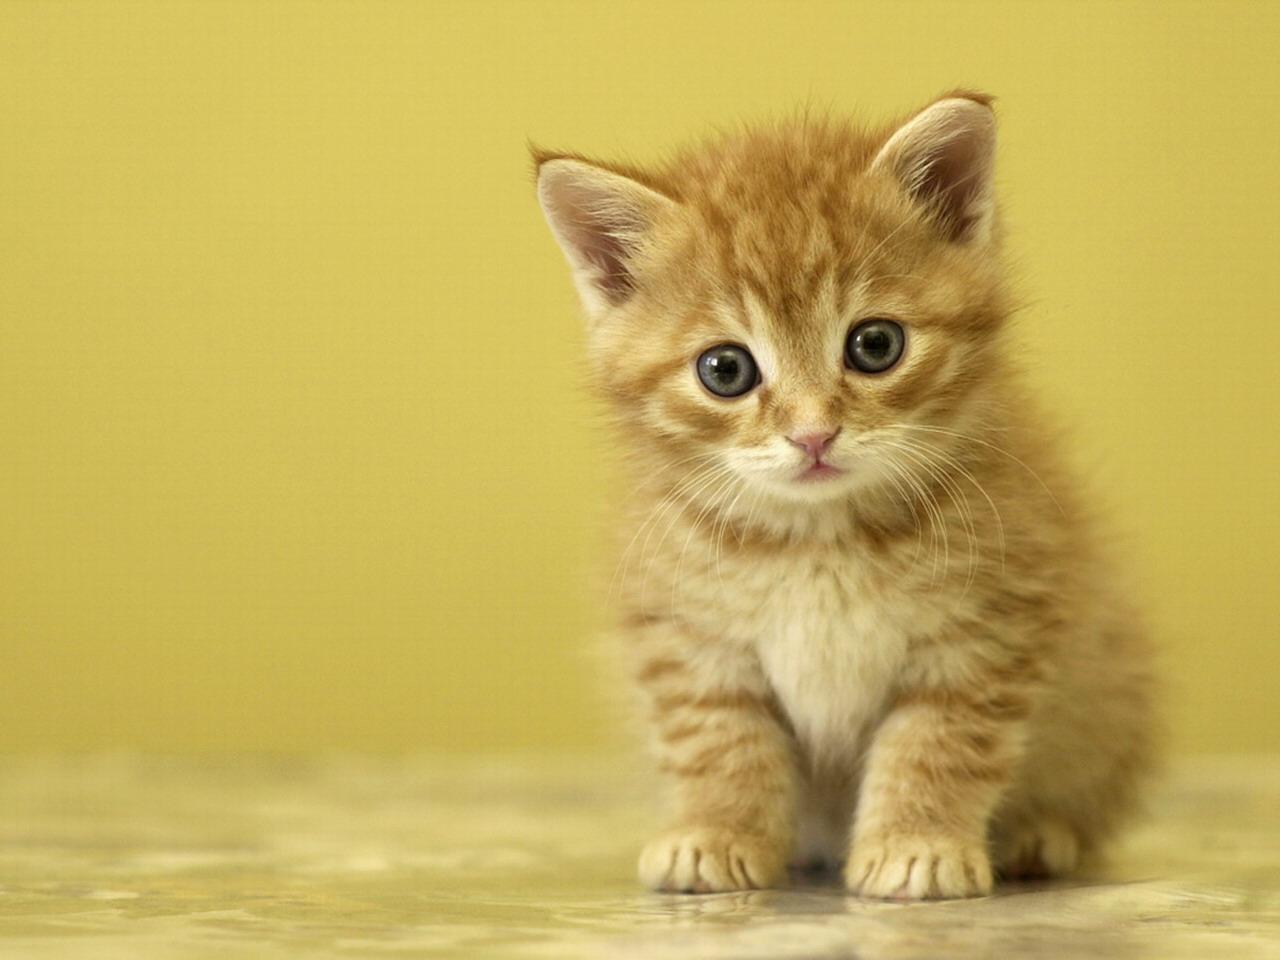 cute kittens wallpaper cute kittens wallpaper cute kittens wallpaper 1280x960